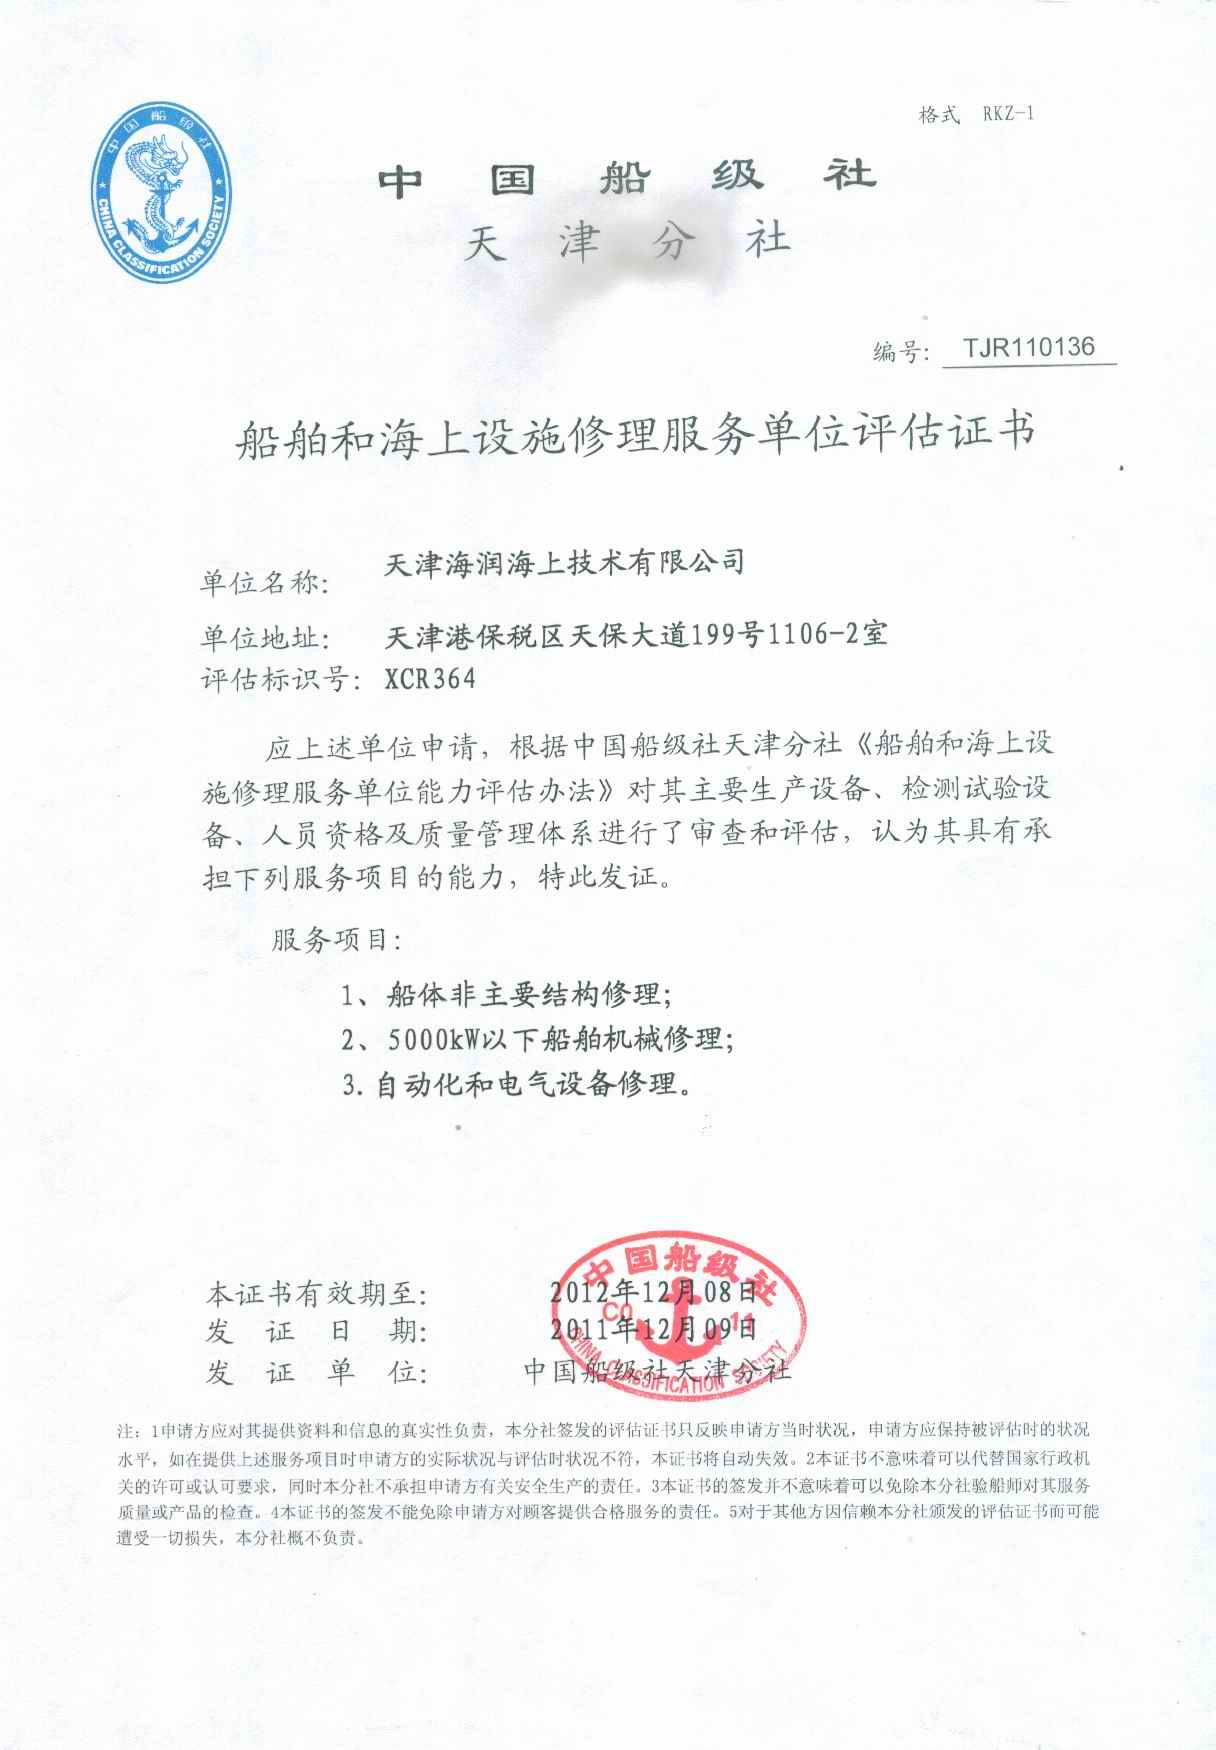 Qualification certificate guangzhou hairun shipping technical co ltd css 02 example6 xflitez Images